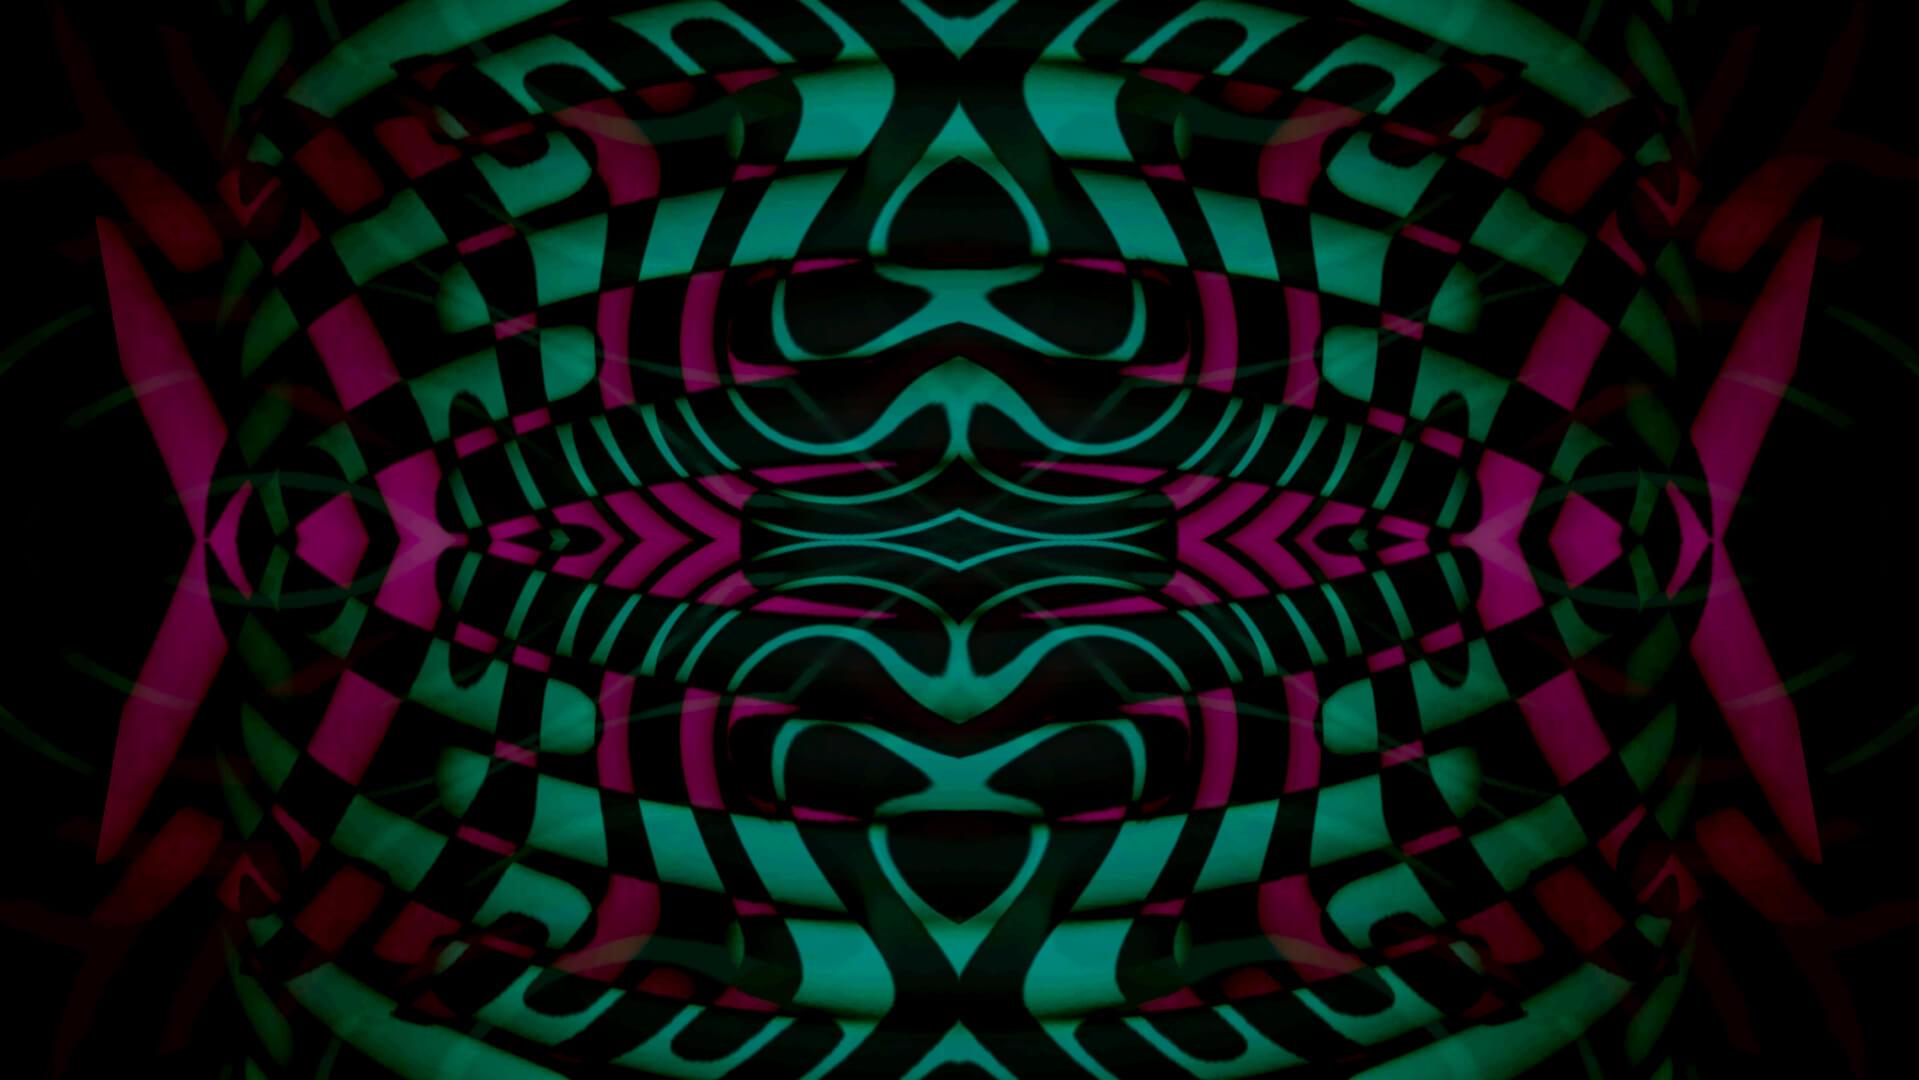 Digital abstract work - by Mitek